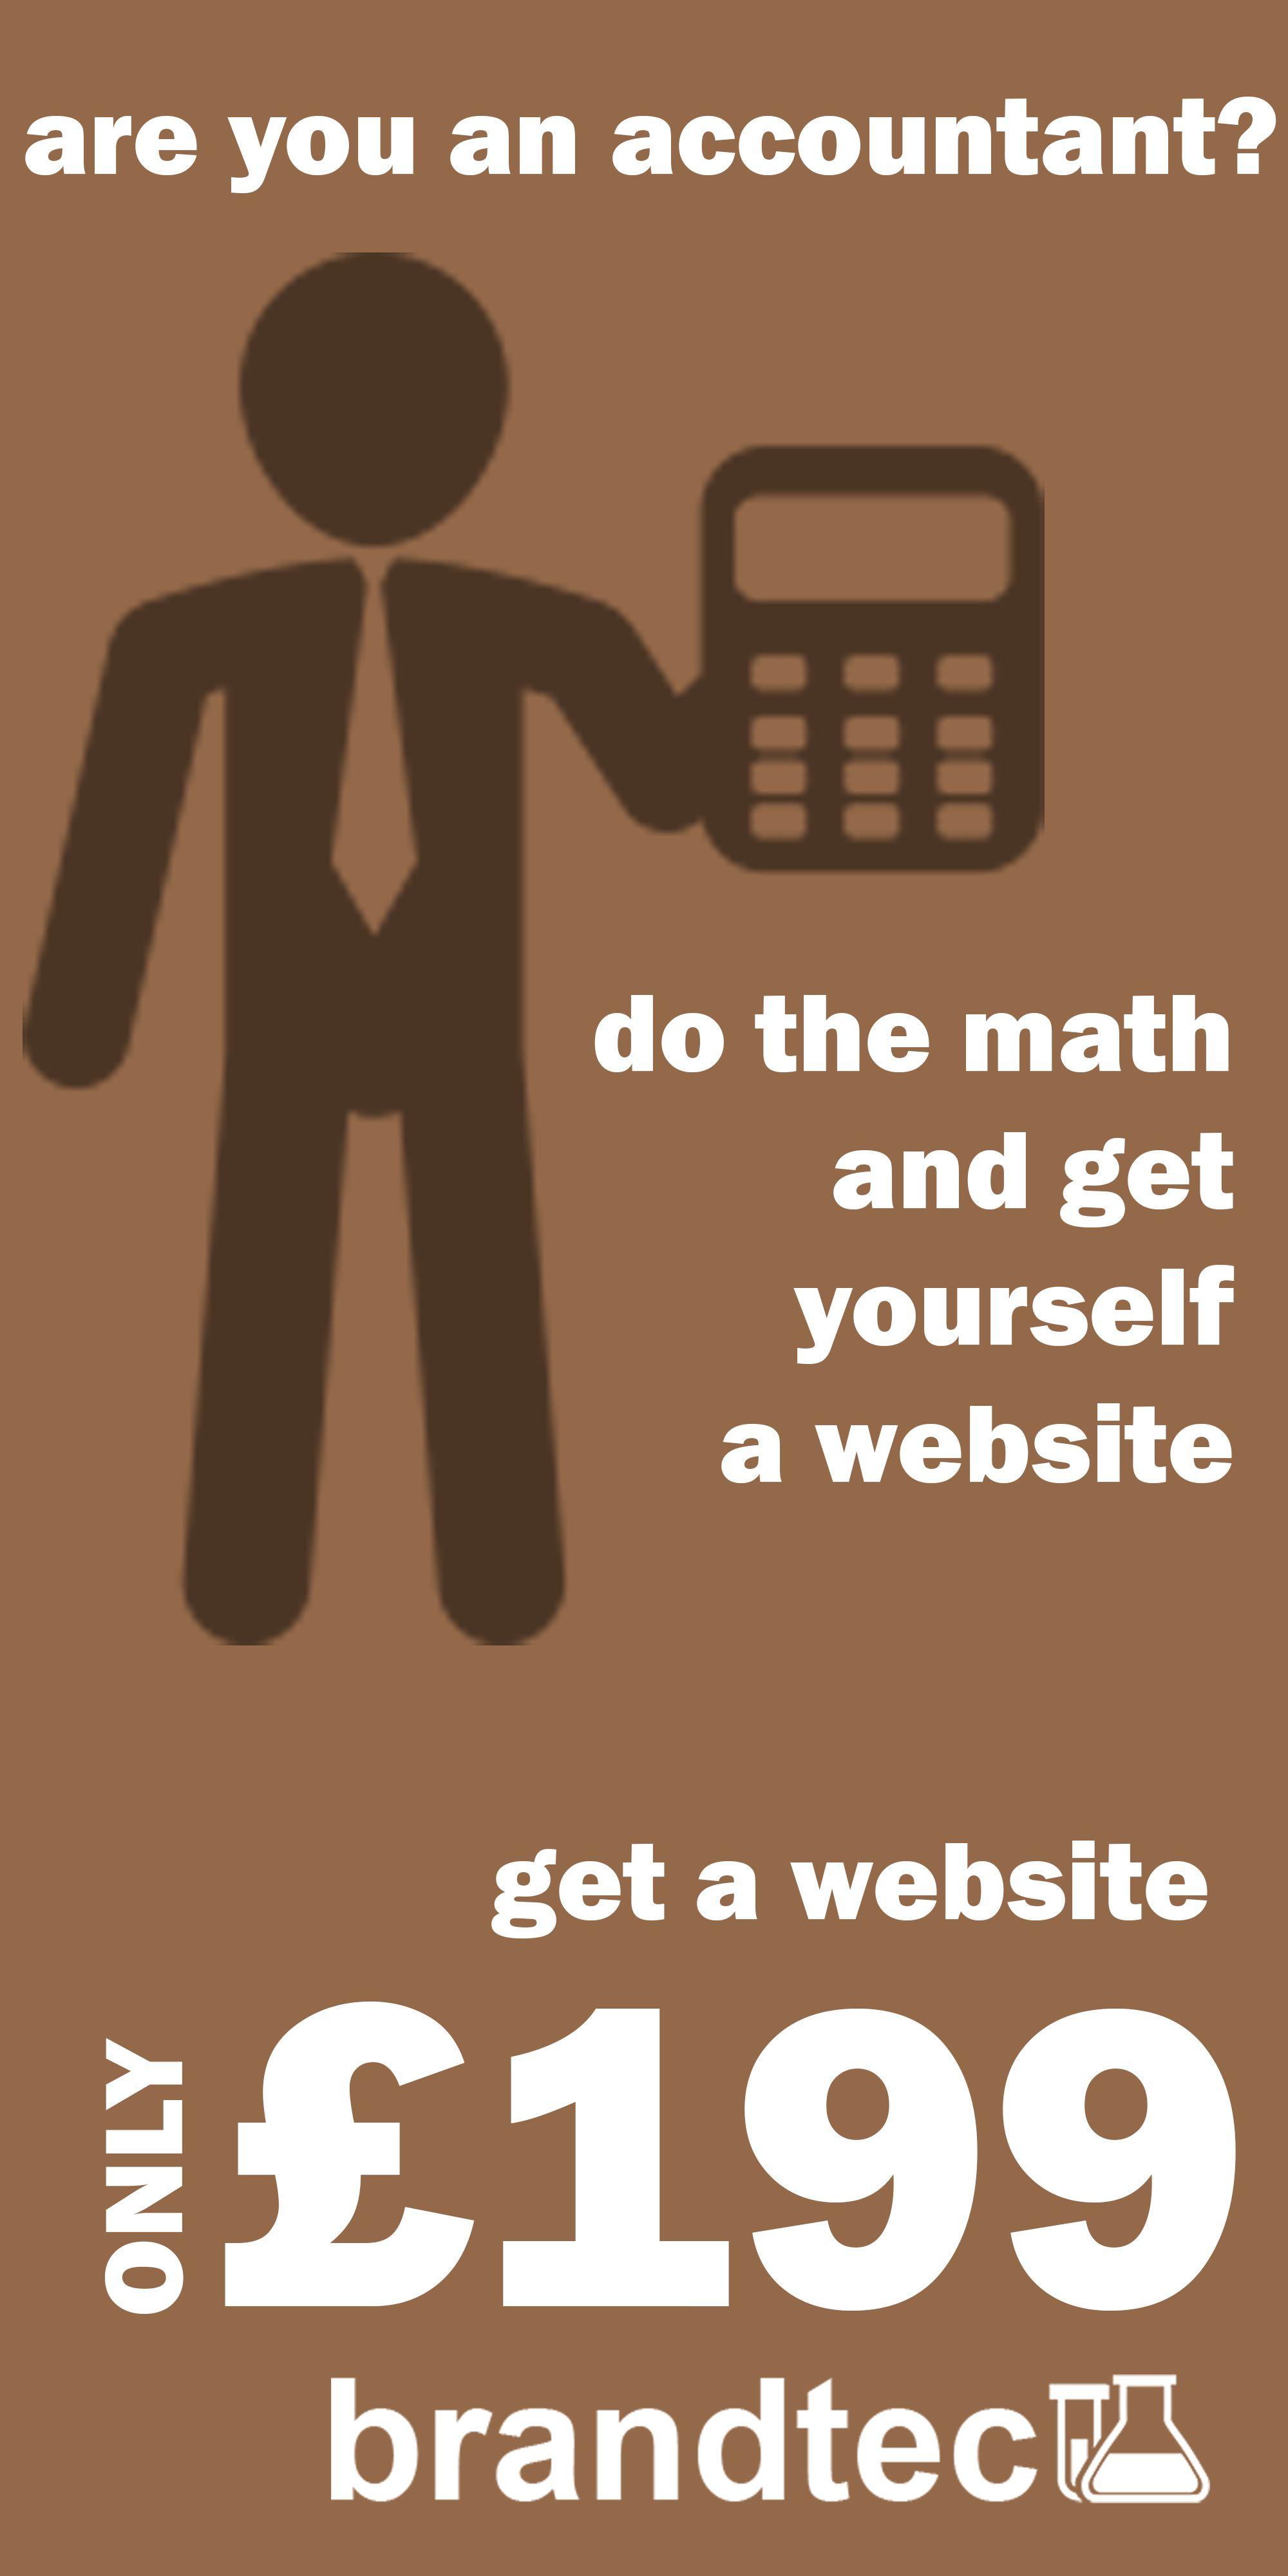 Brandtec Web Design Brandtec Web Design Uk Marketing Agency Web Design Web Design And Hosting Web Design Company Web Design Cost Web Design Gaming Logos